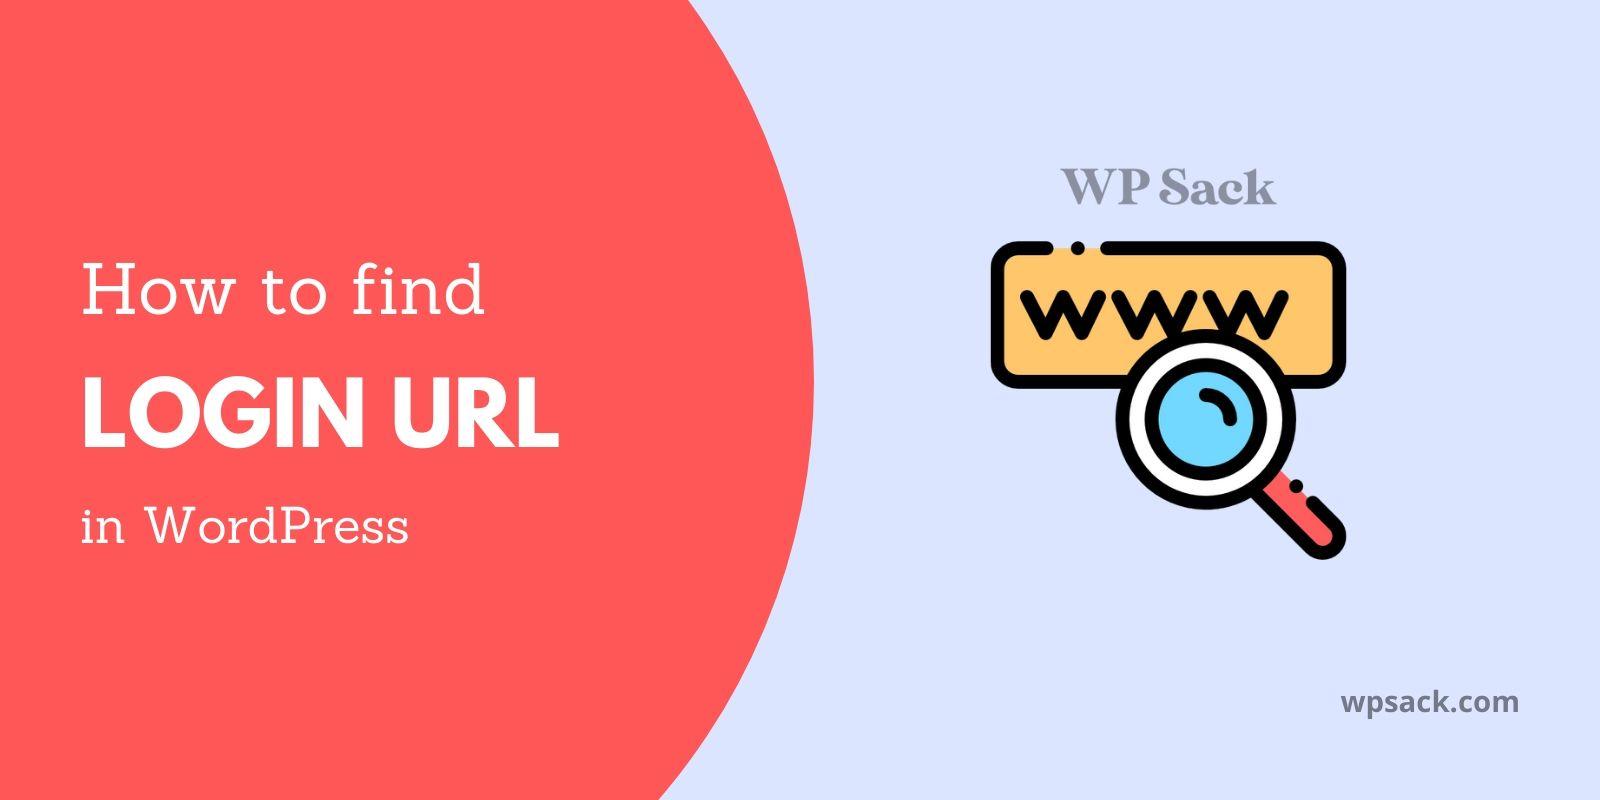 Find login URL in WordPress